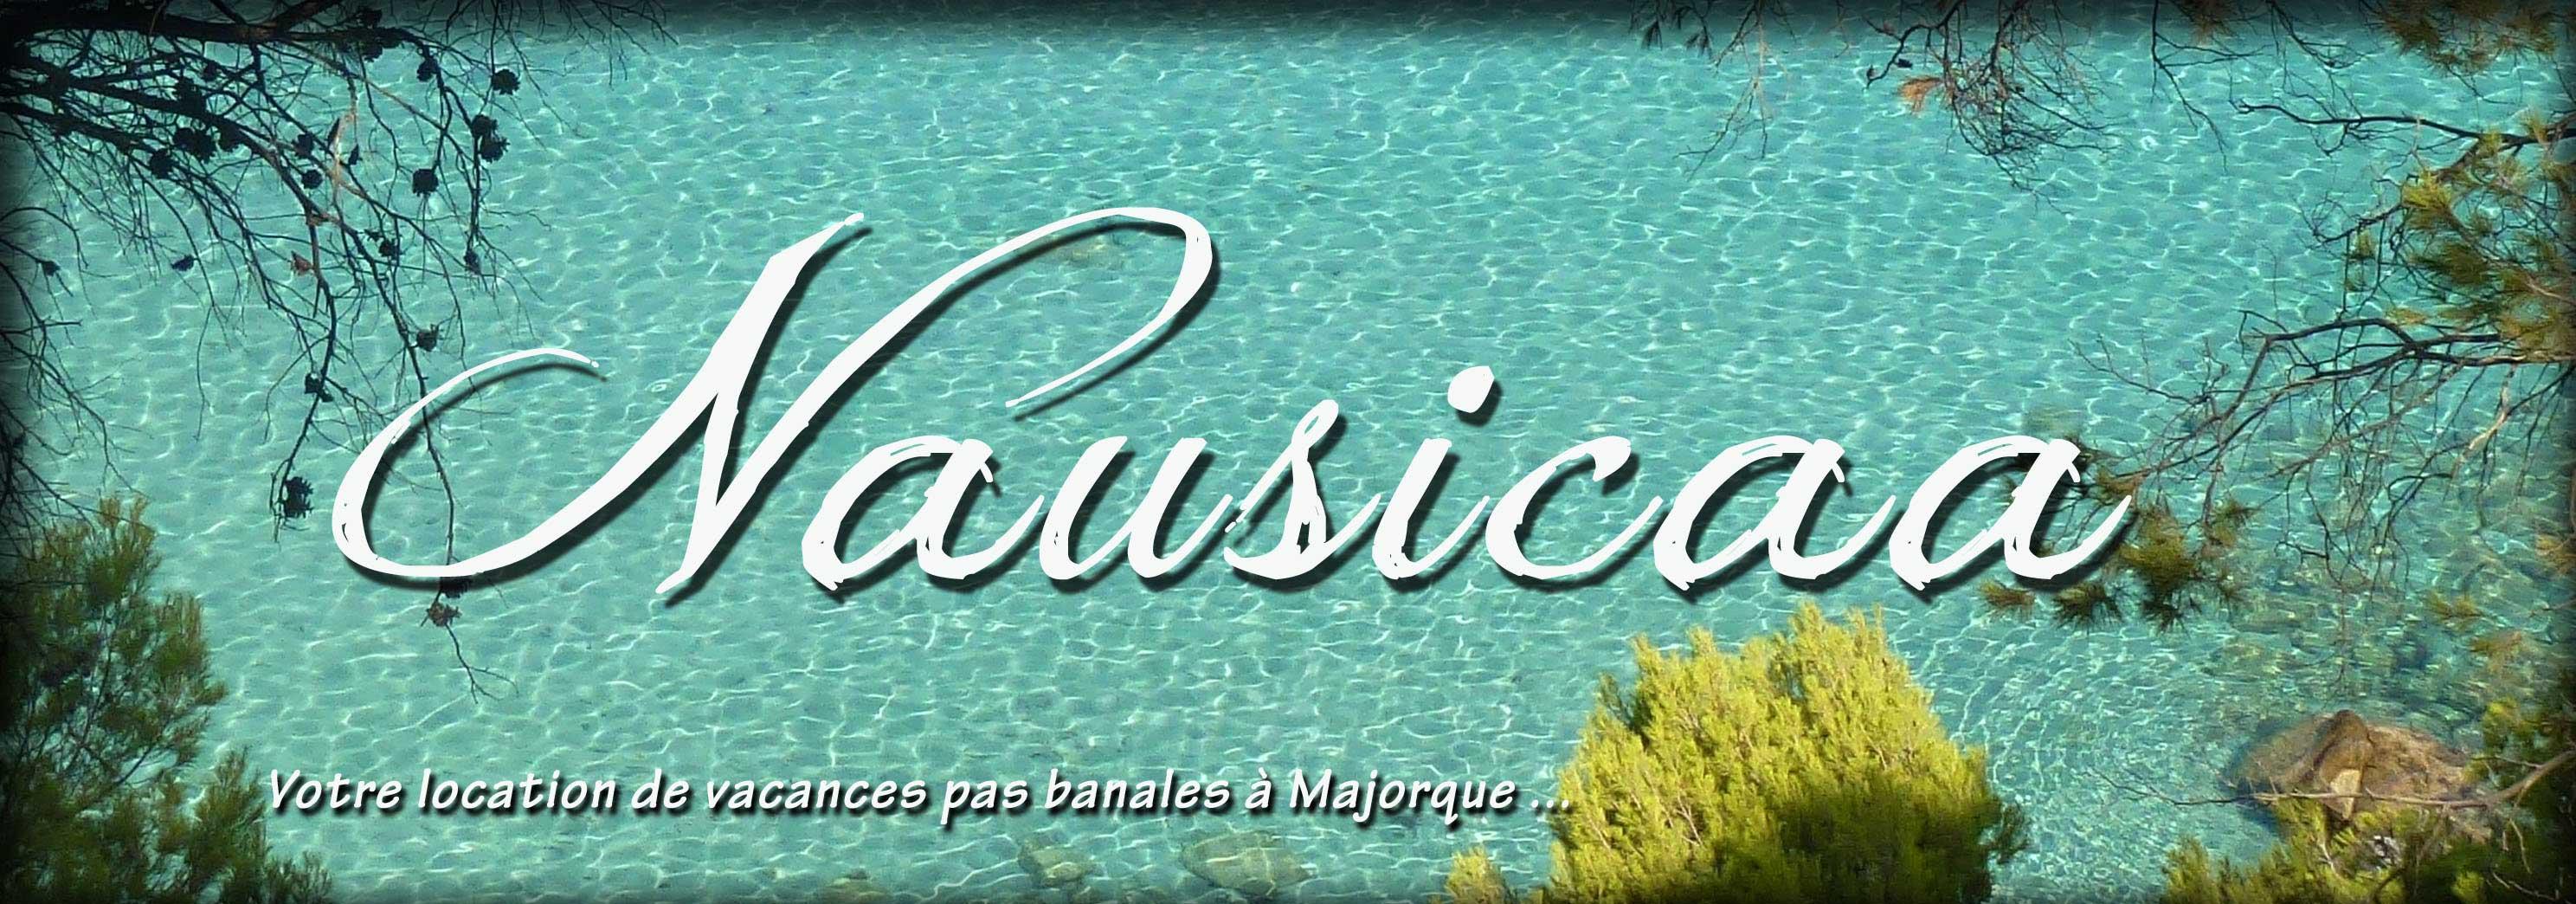 Location de vacances à Majorque